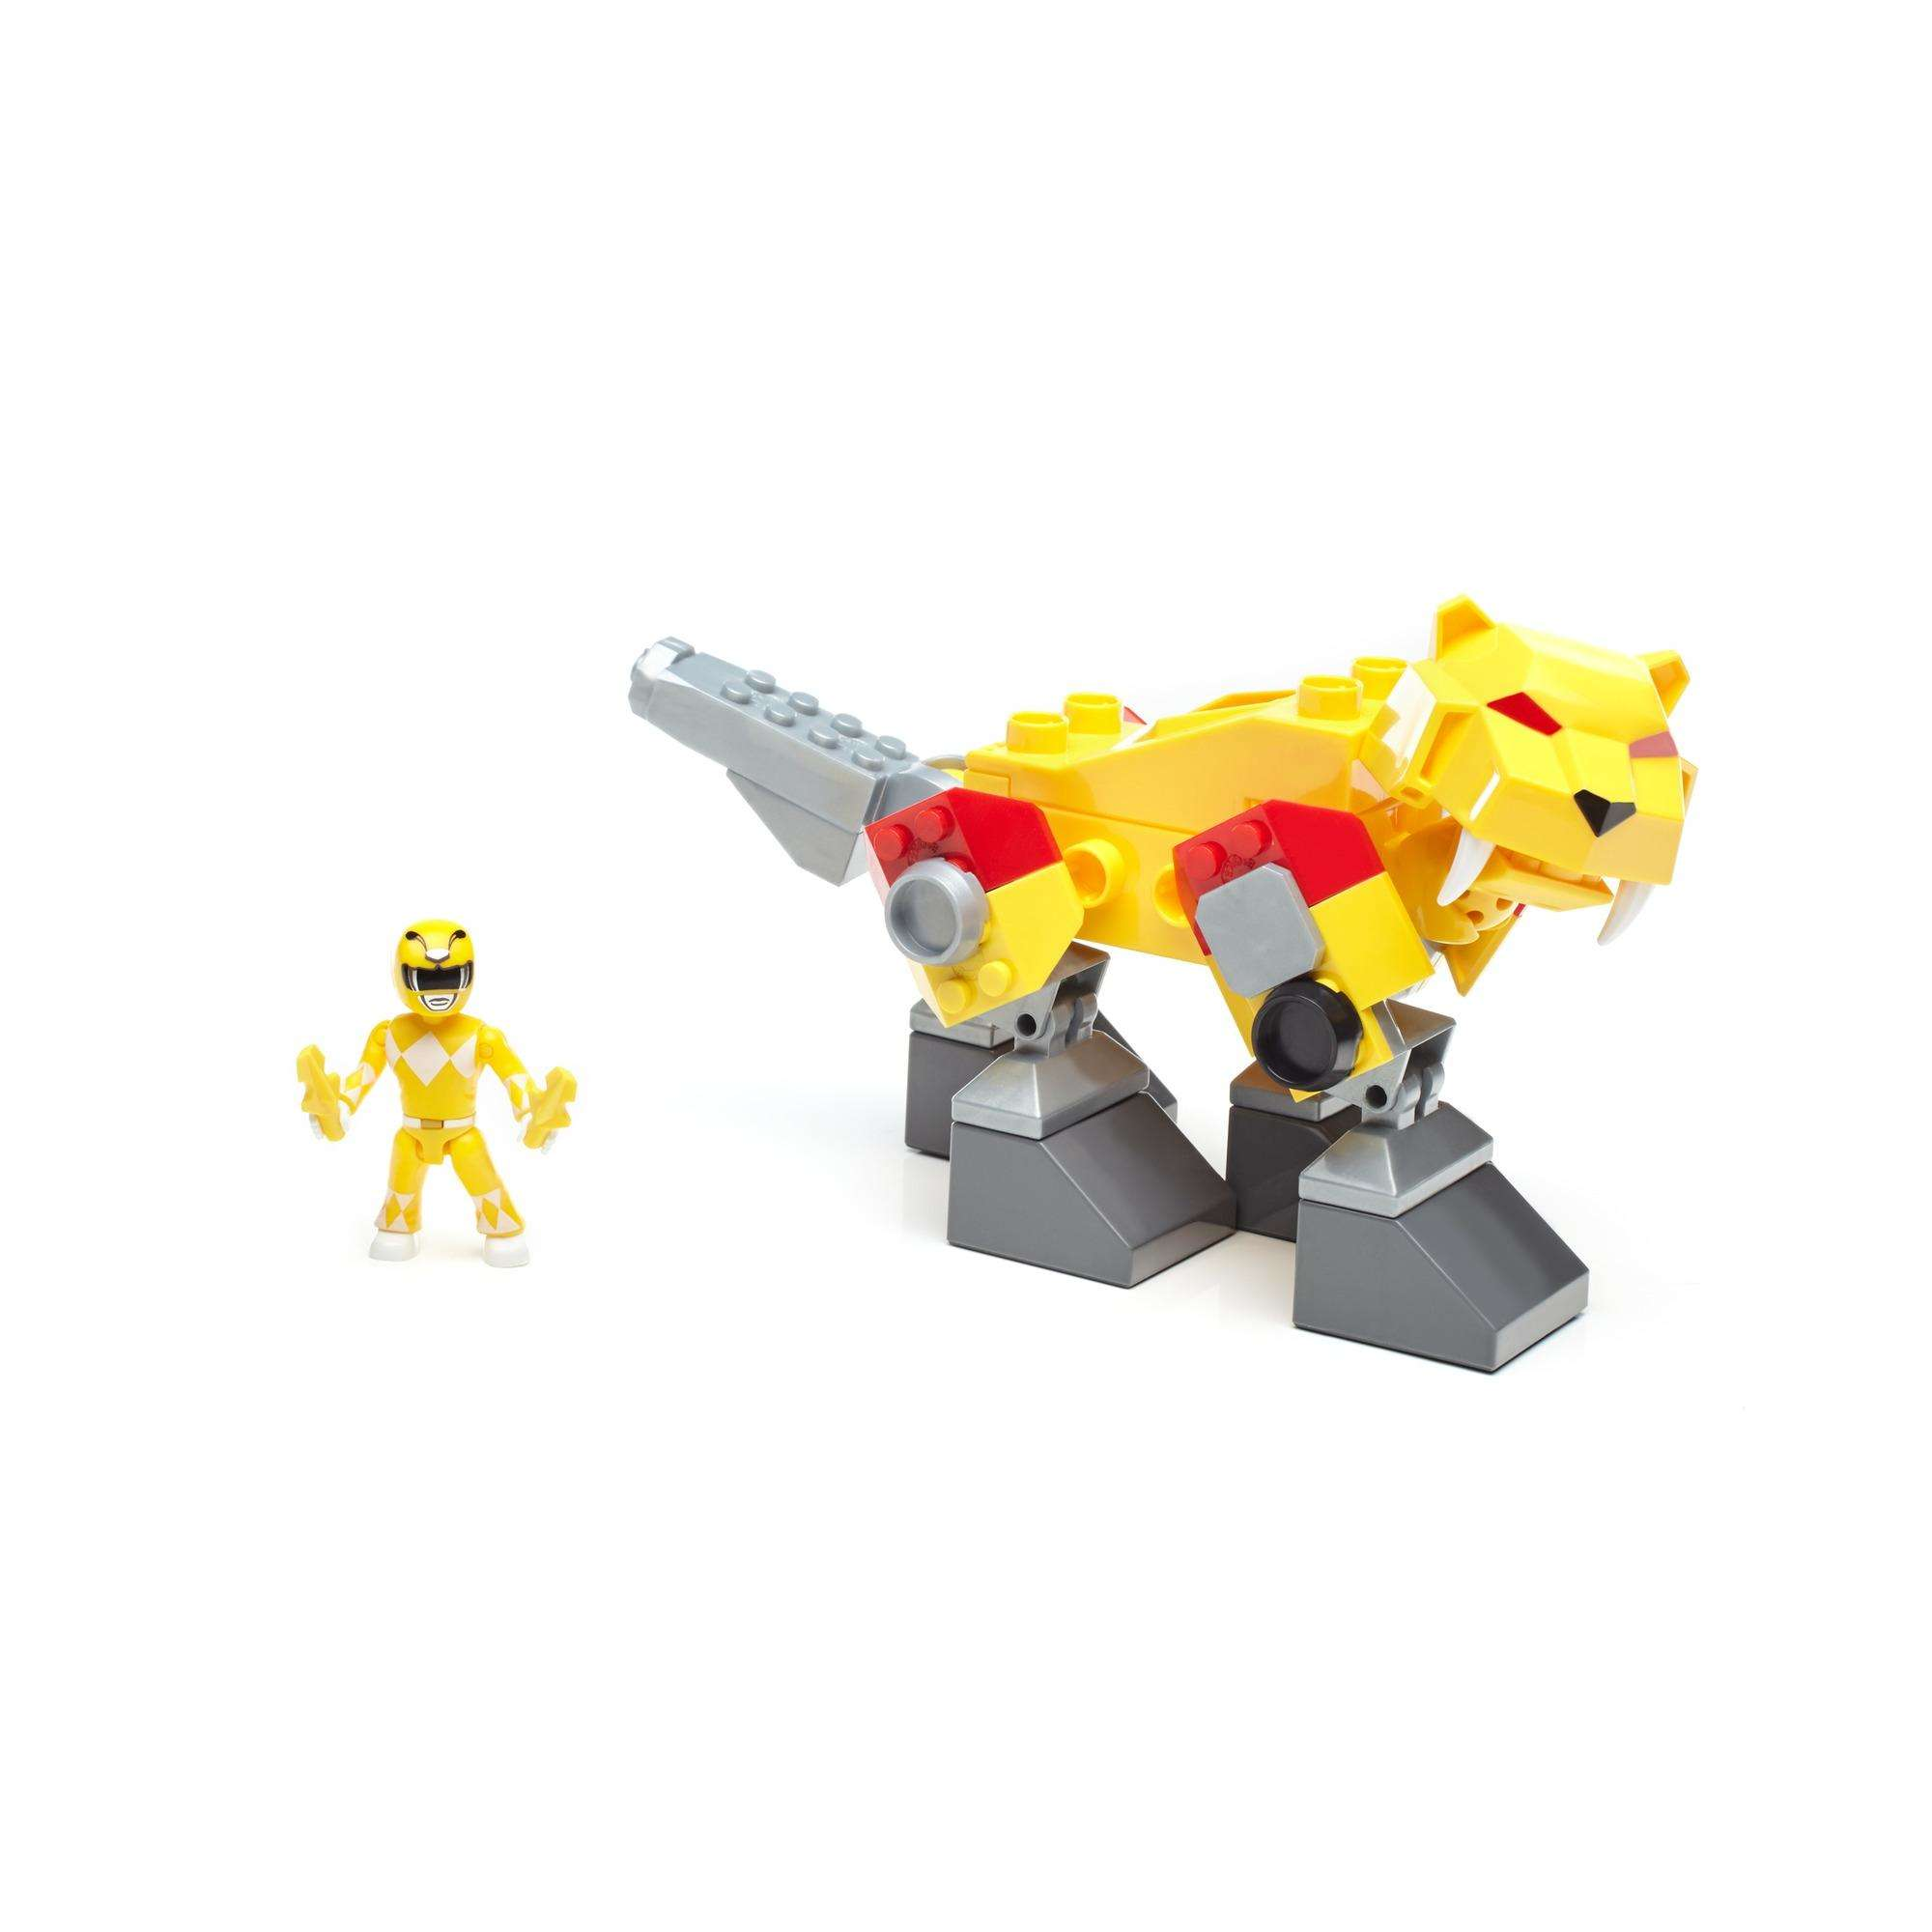 Mega Construx Power Rangers Sabertooth Zord by Mattel